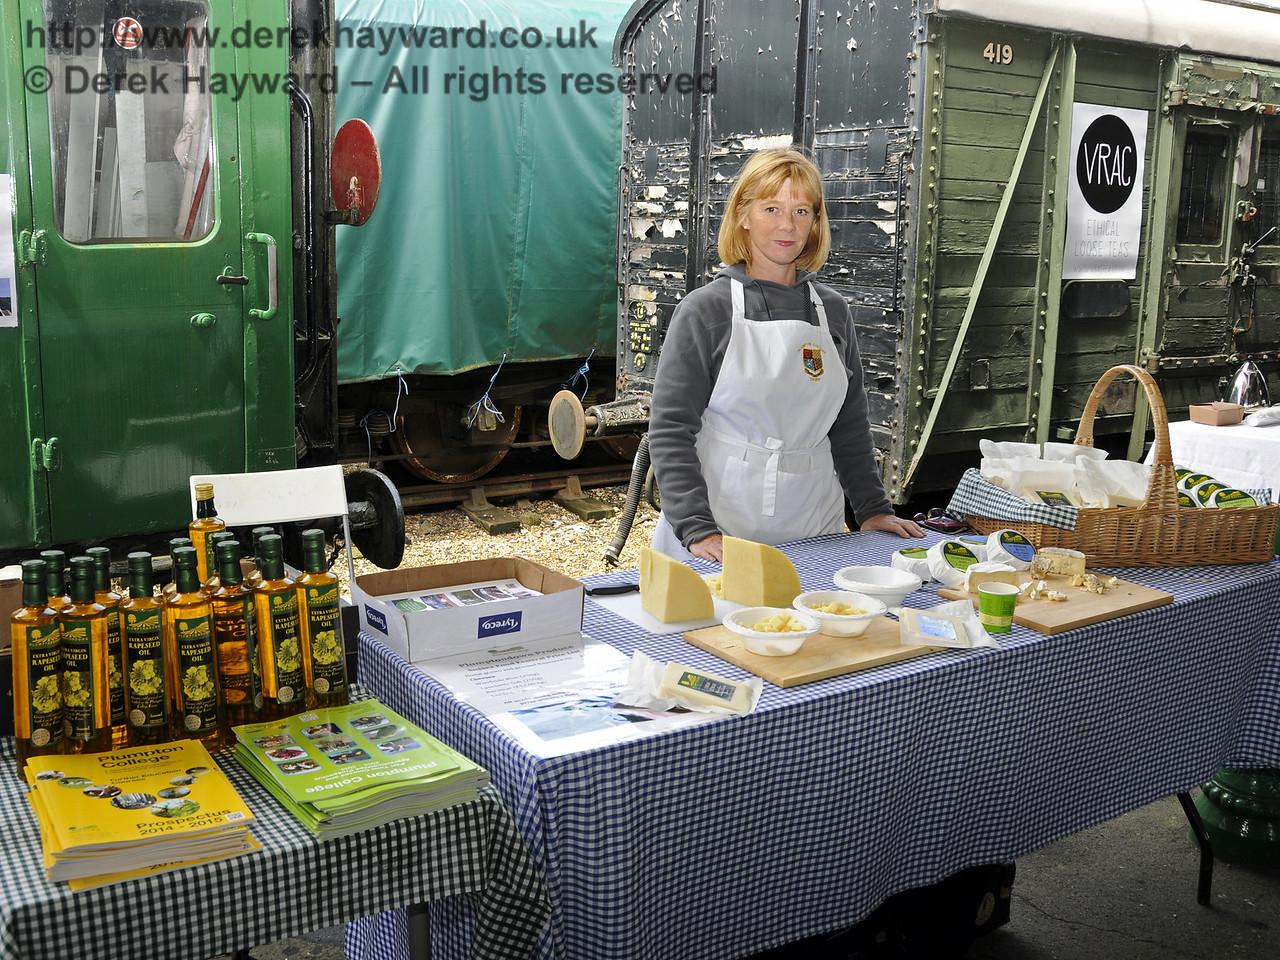 Plumpton College Dairy.  Sussex Food Festival, Horsted Keynes, 05.07.2014  11021